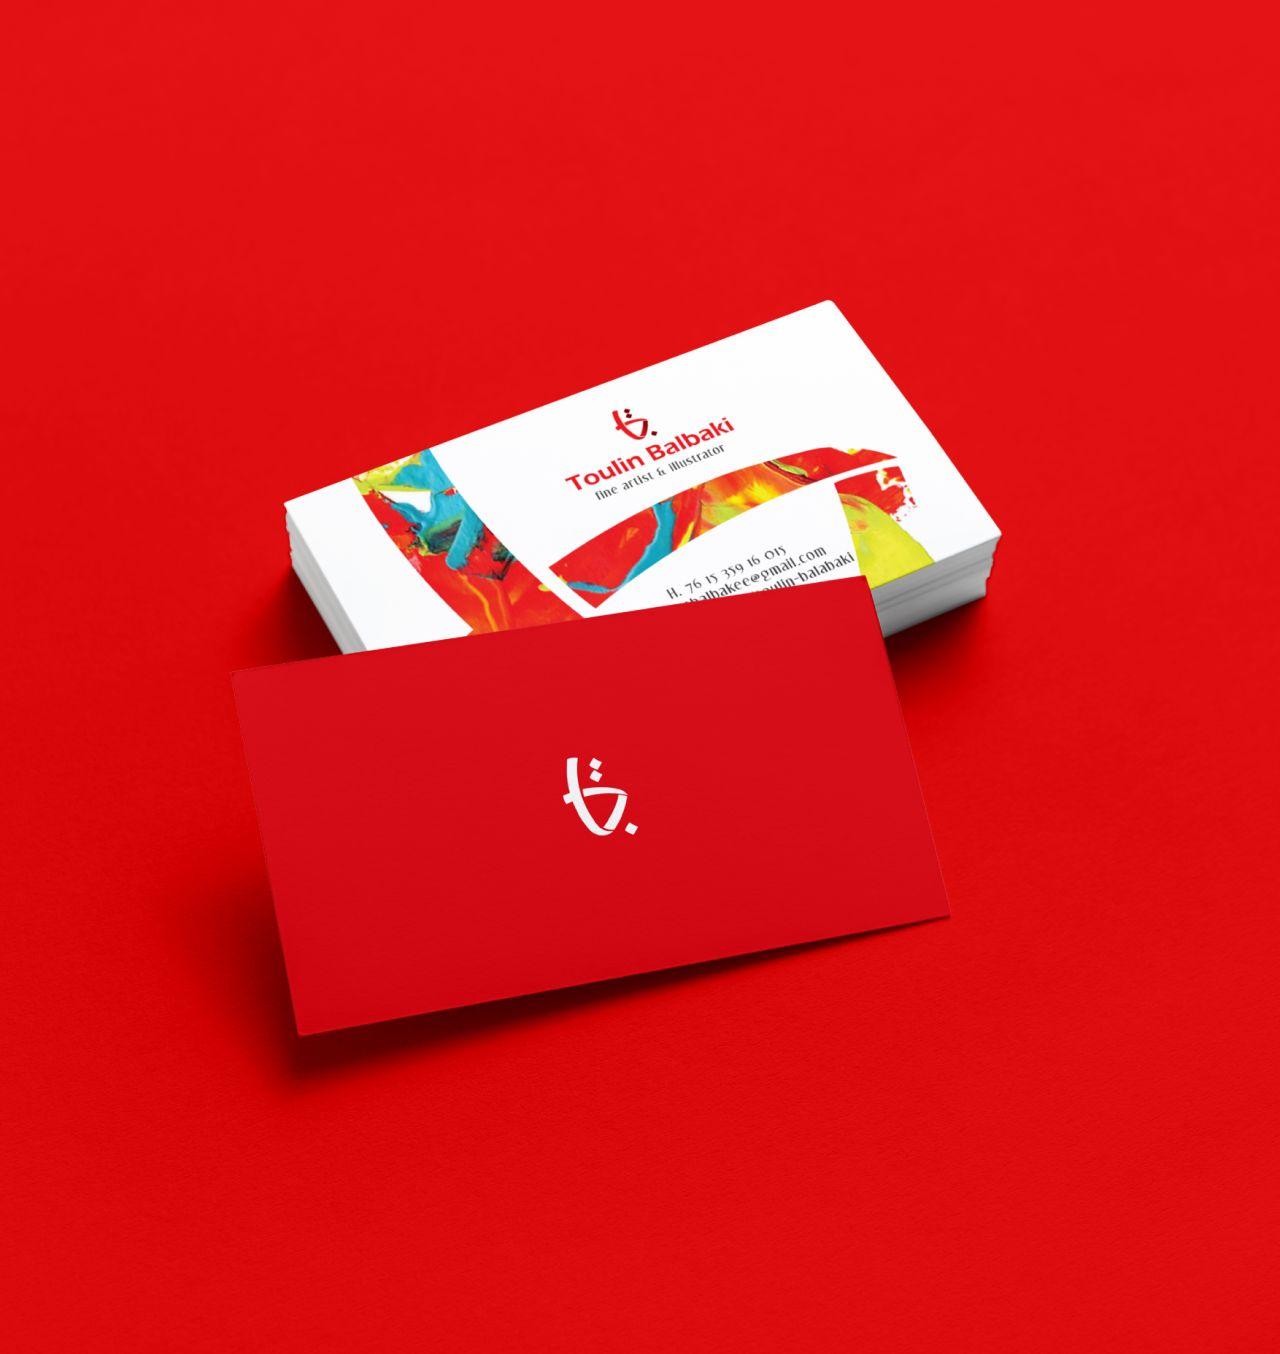 Toulin Balabaki visual ID for Business card.